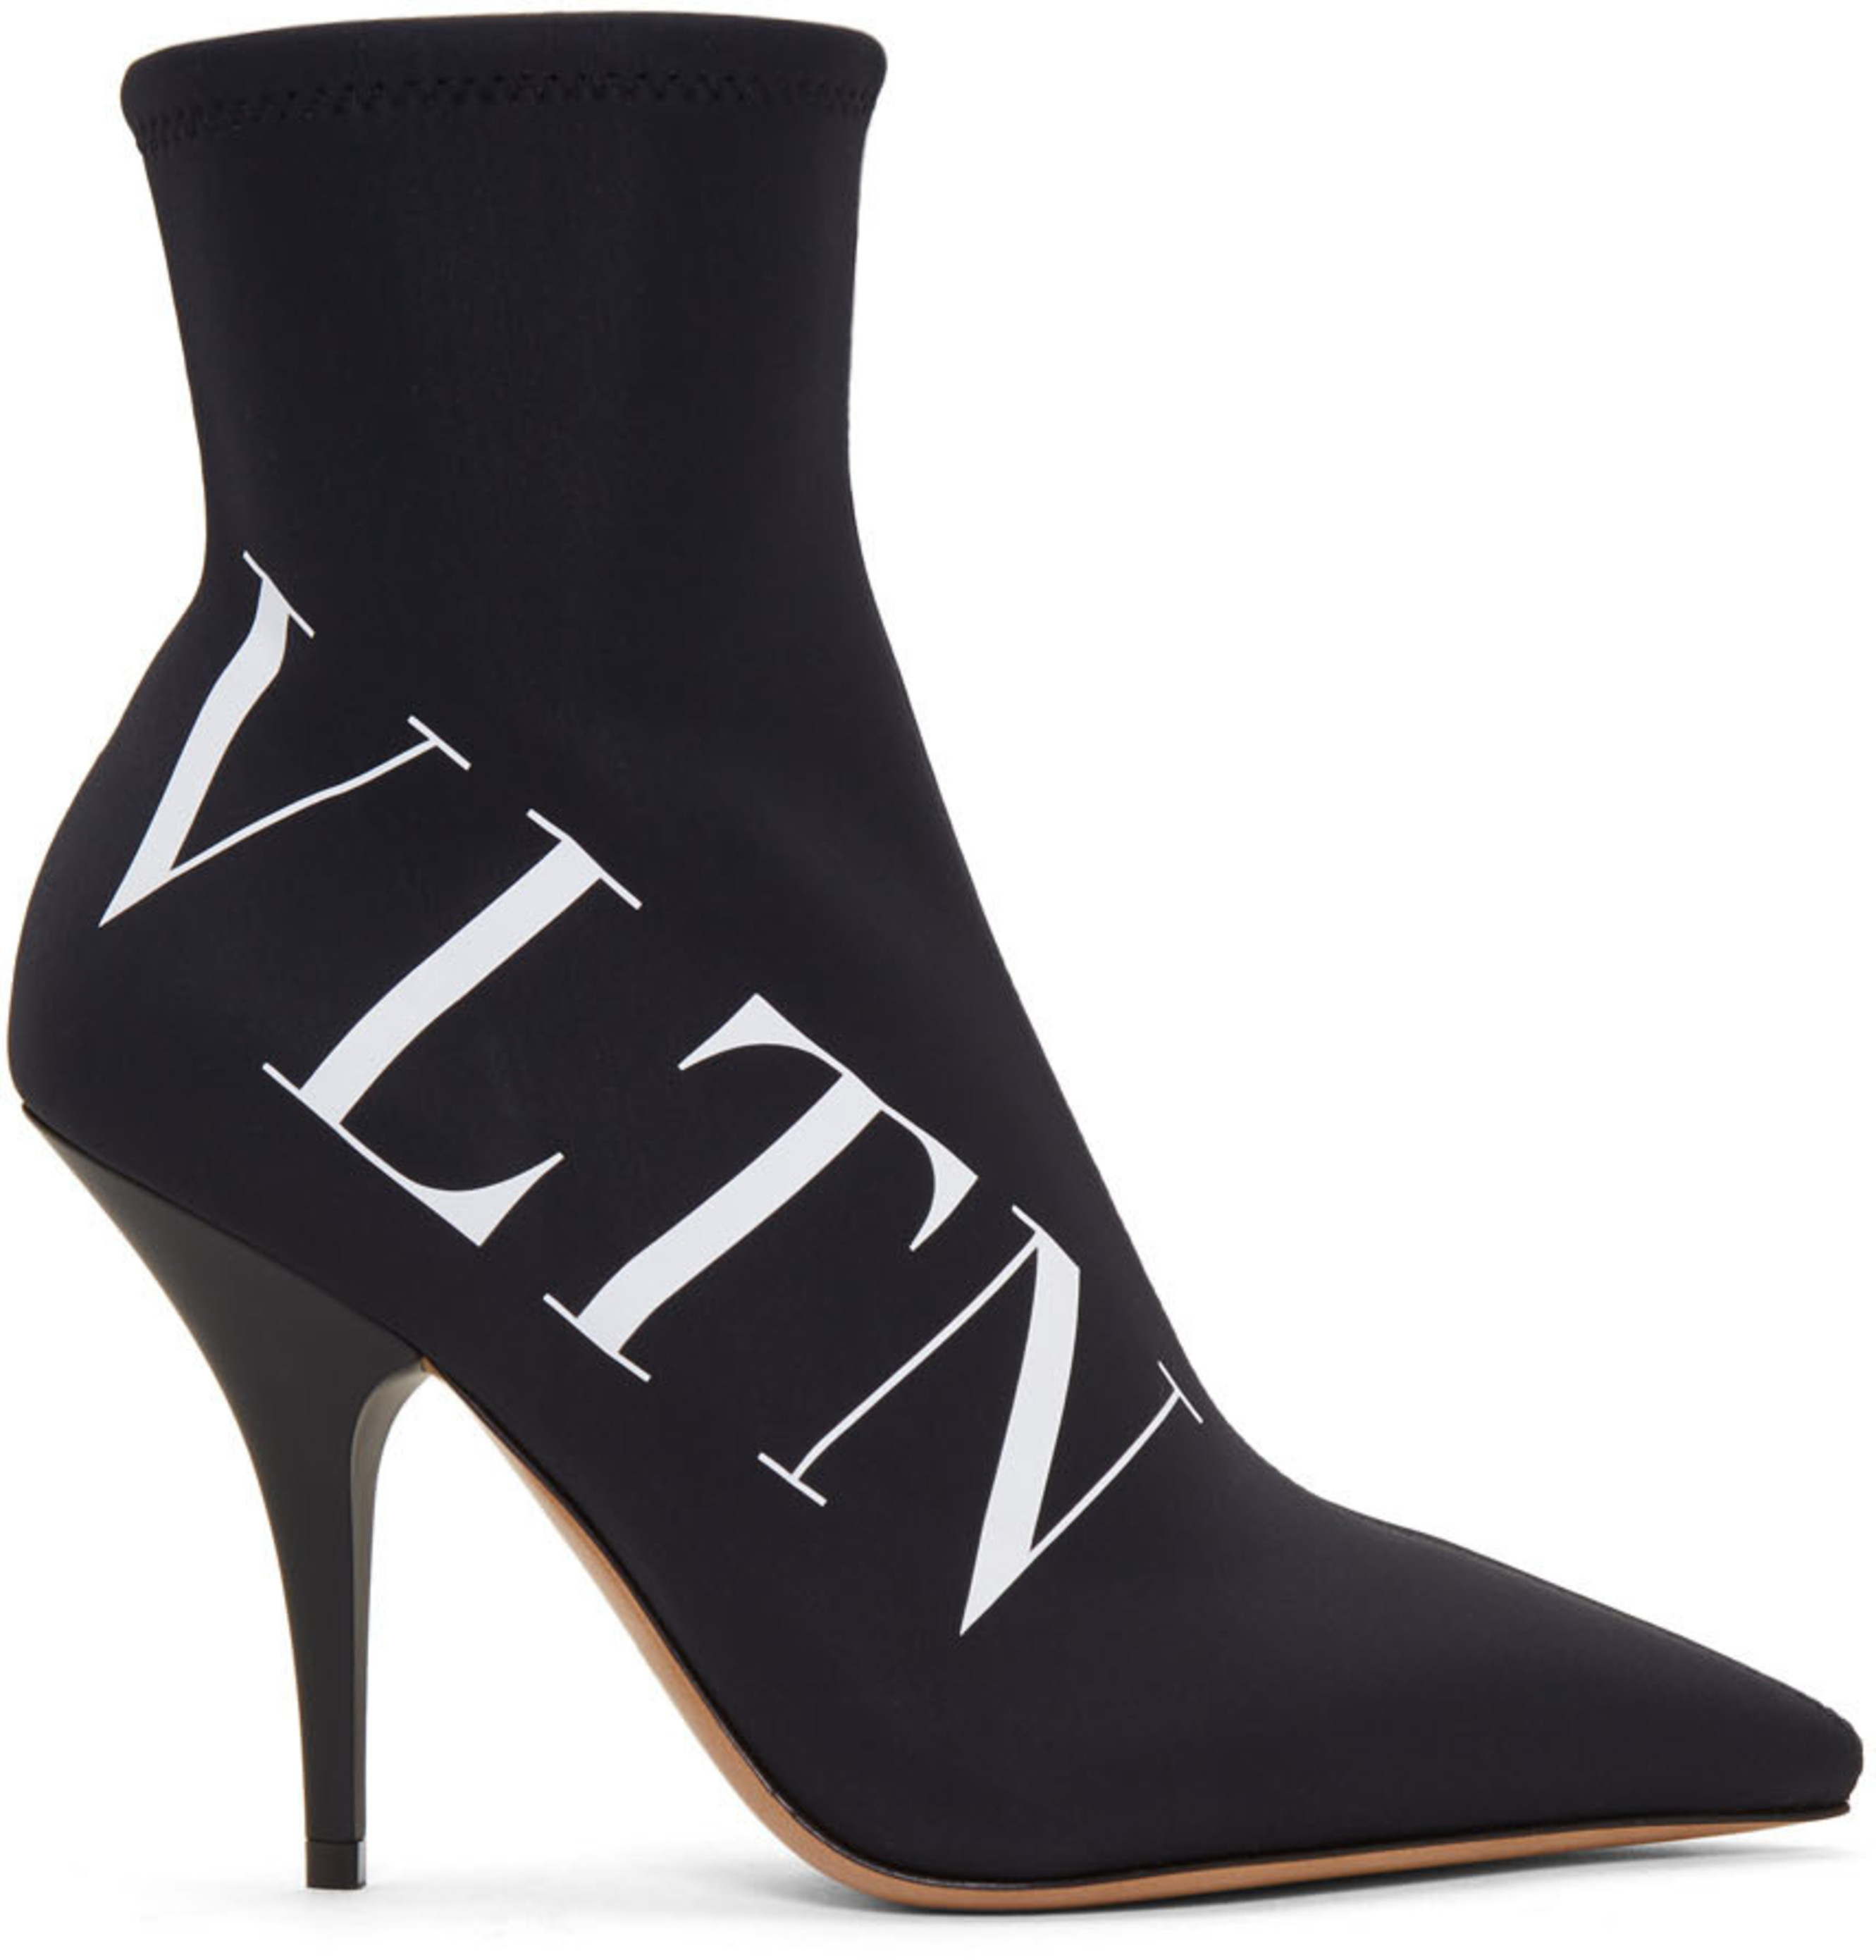 422f6719fa63 Valentino shoes for Women